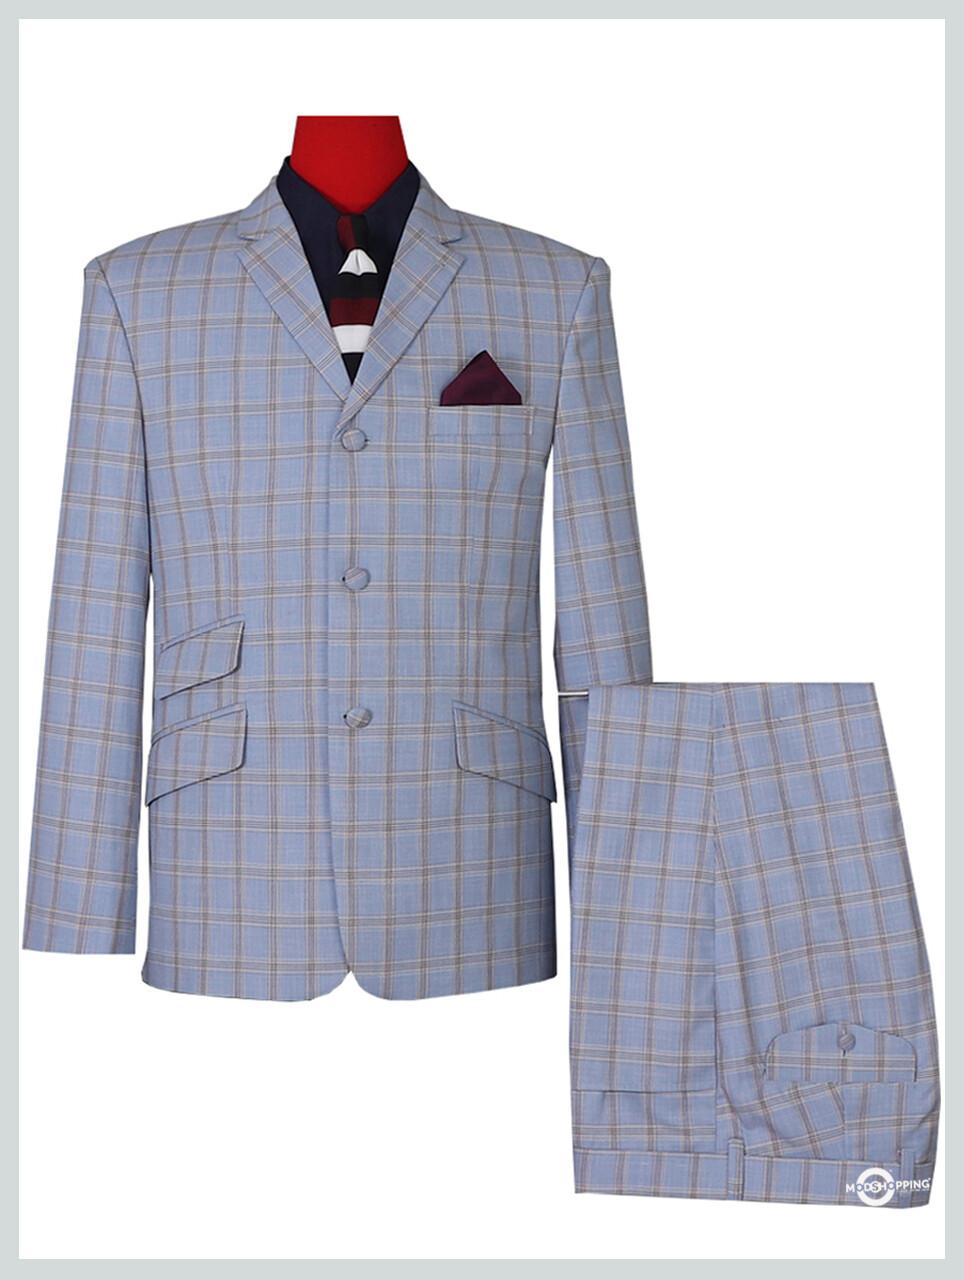 Sky Windowpane Check Mod Suit Vintage Style